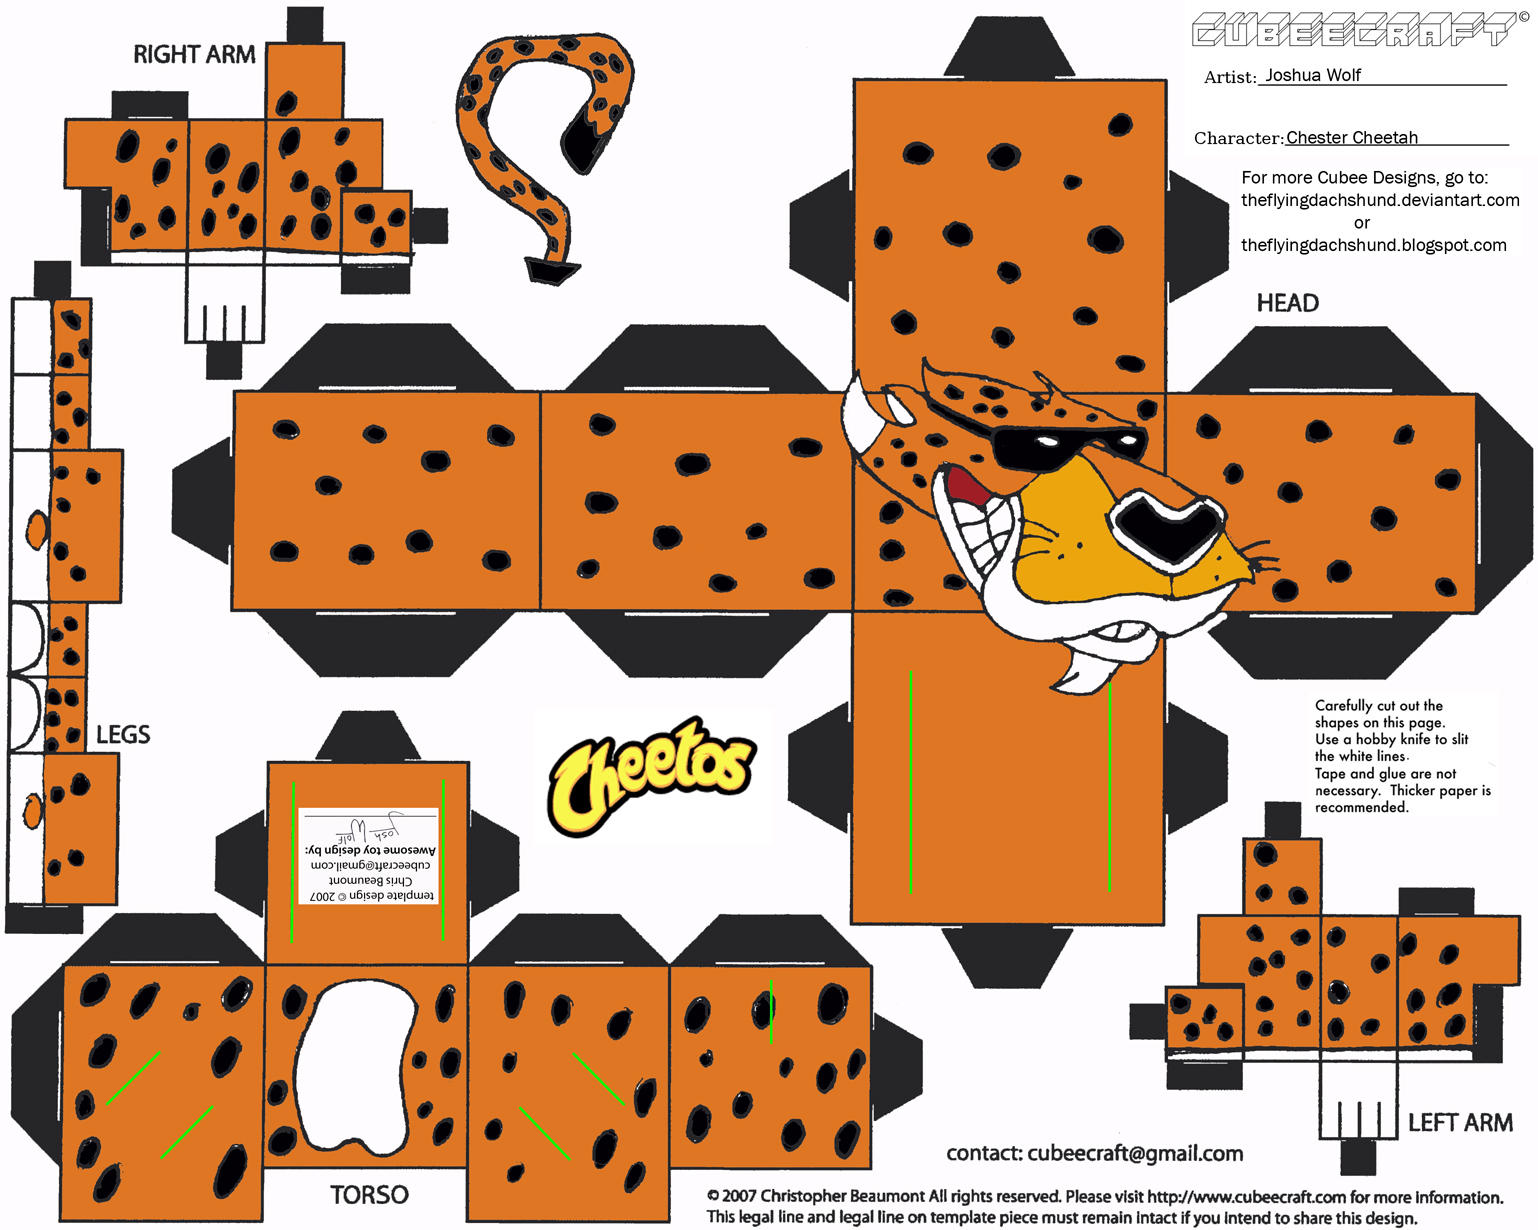 ADV CH1: Chester Cheetah Cubee by TheFlyingDachshund